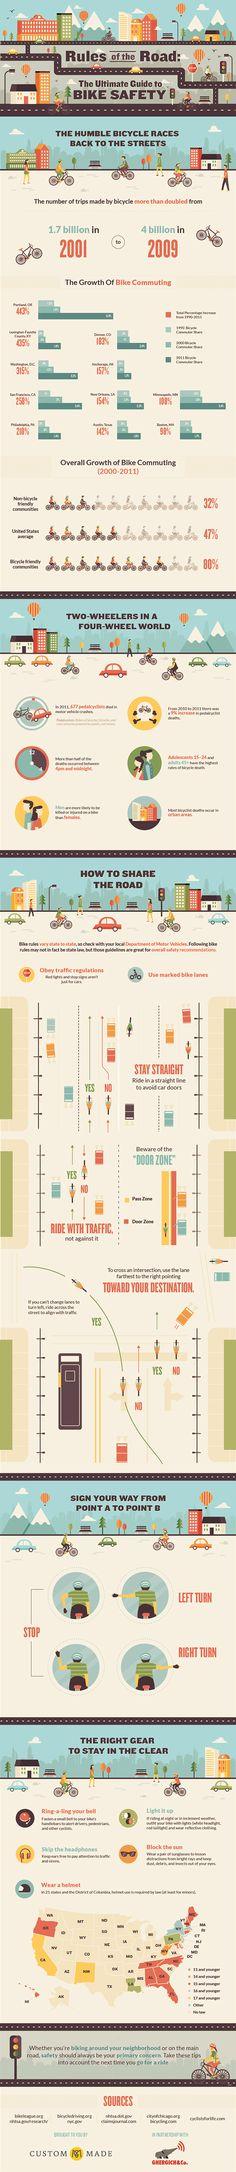 Unique Infographic Design, The Ultimate Guide To Bike Safety via @mstresky #Infographic #Design #Bike